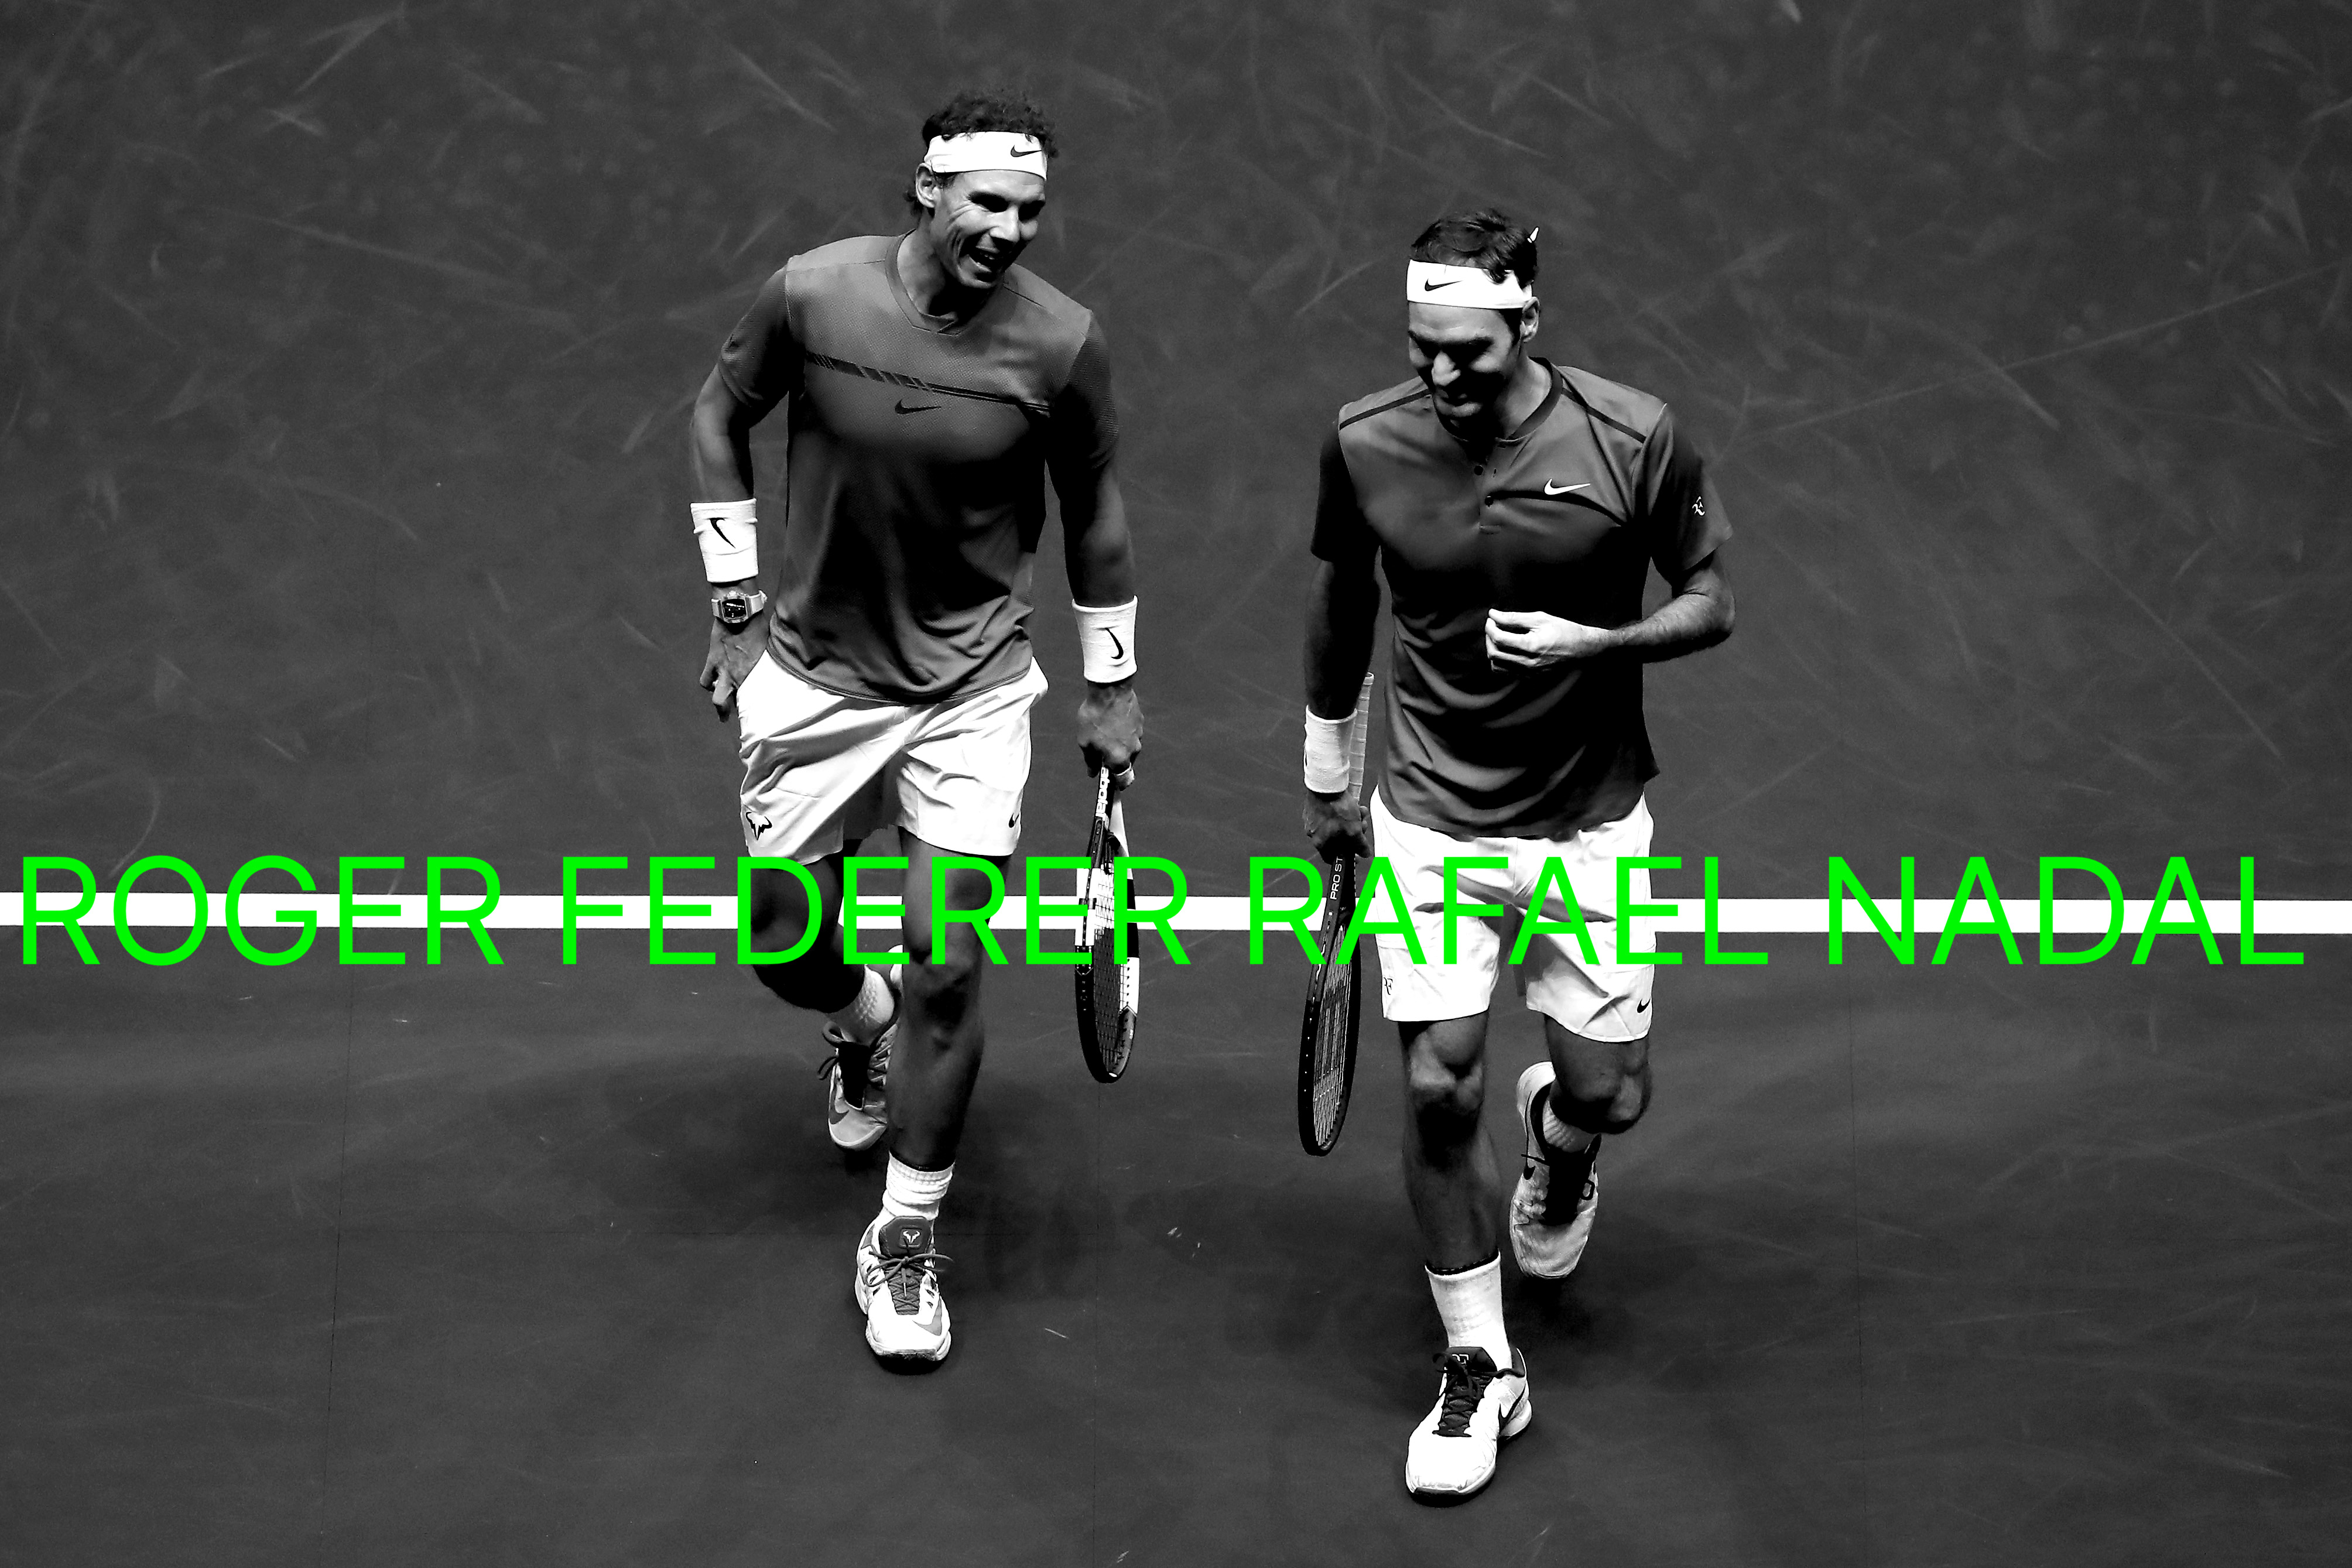 Давид Налбандян, Мария Шарапова, Серена Уильямс, Рафаэль Надаль, Роджер Федерер, Энди Маррей, US Open, Australian Open, ATP